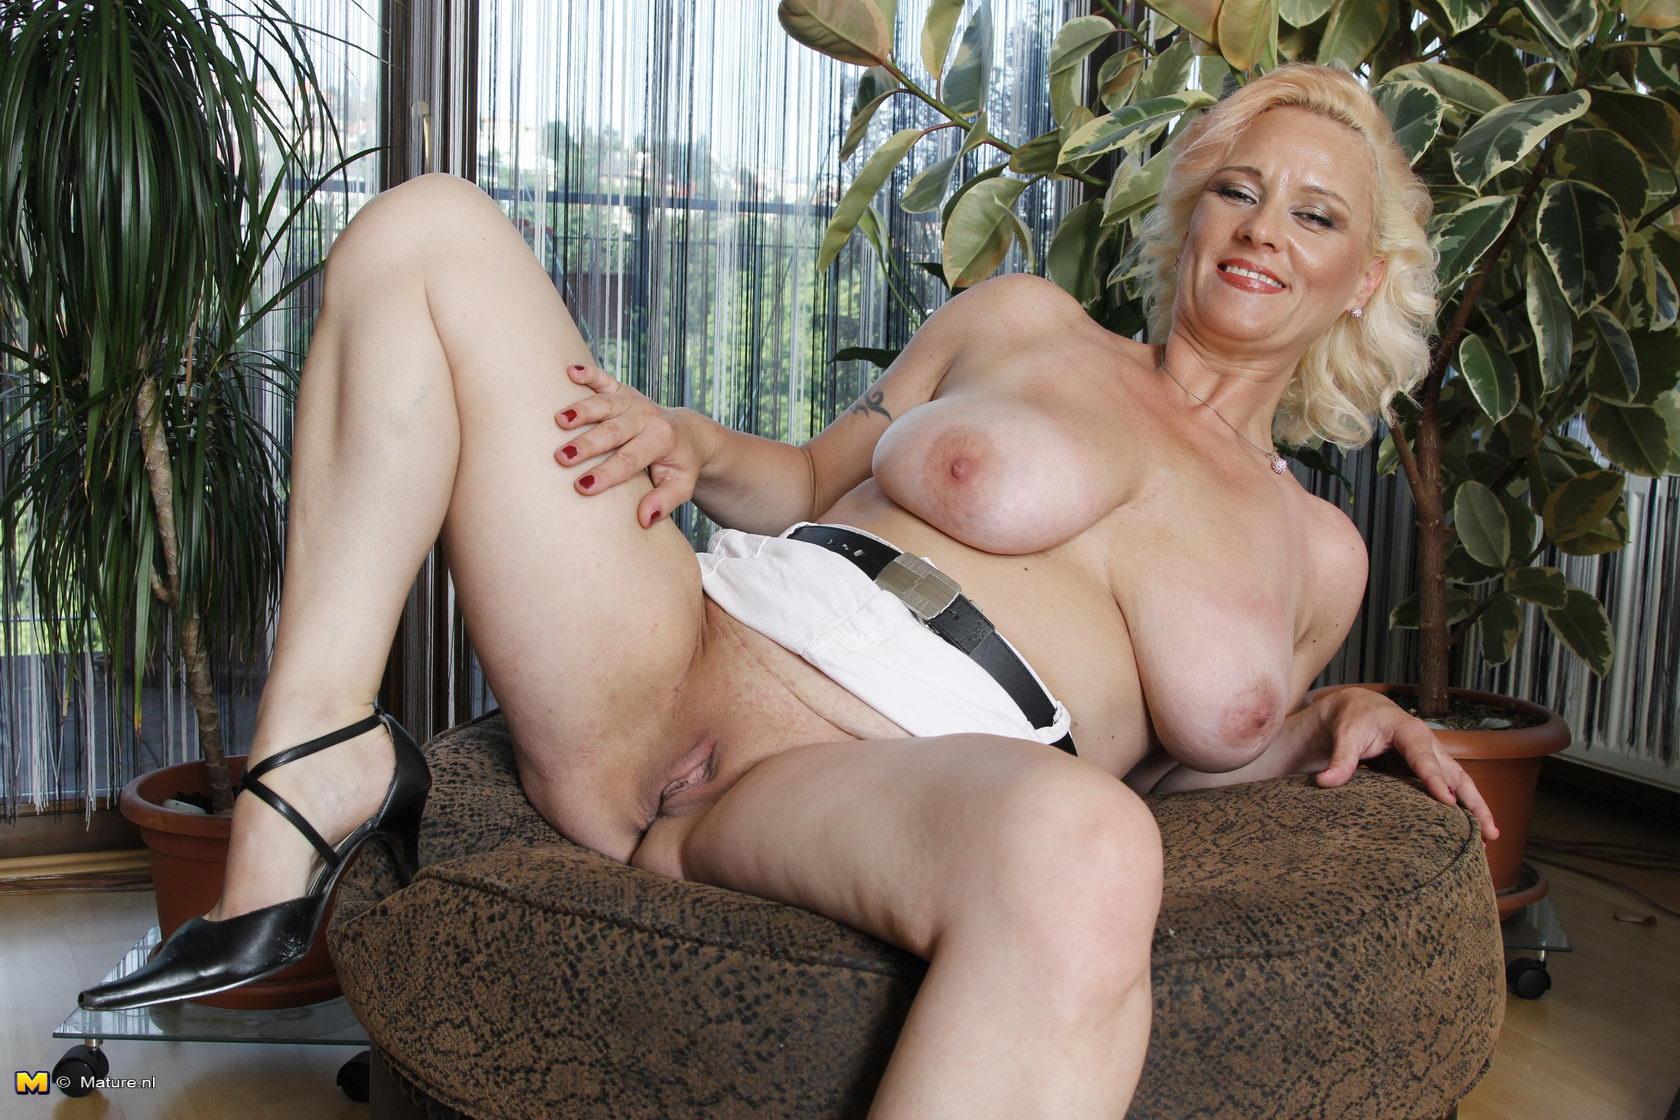 Photos of women having orgasm